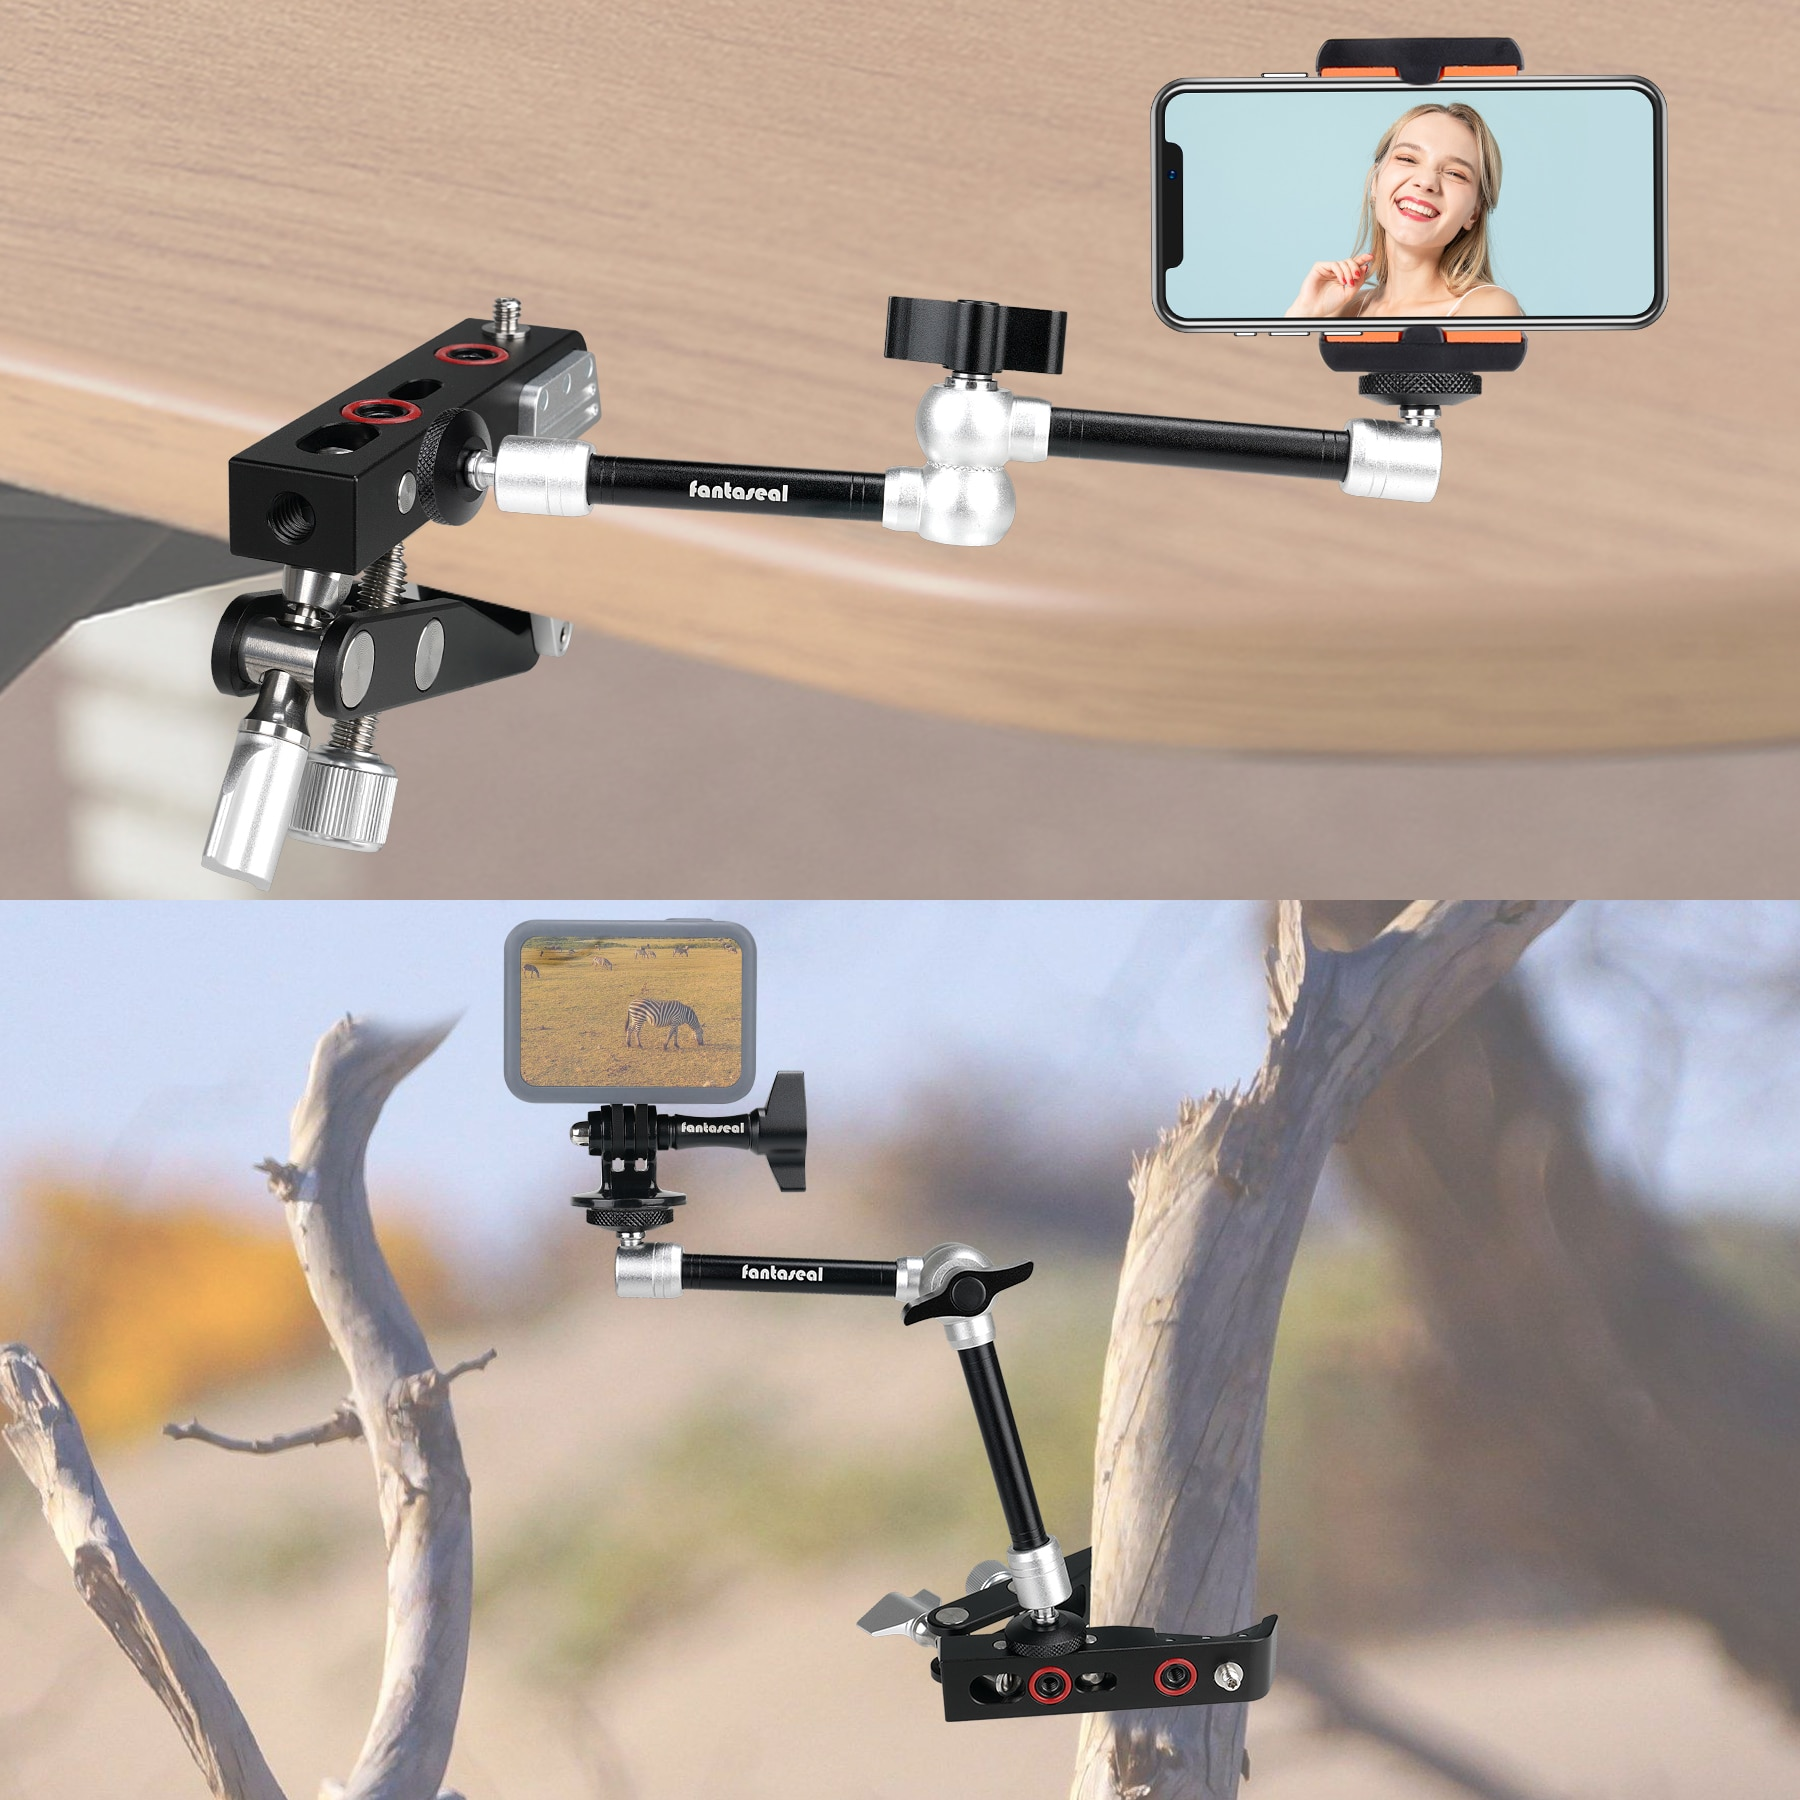 Heavy Duty DSLR Camera Camcorder Super Clamp Mount Irregular-Object Fix Holder Mounts Kit w/Magic Arm +Quick Release Plate enlarge